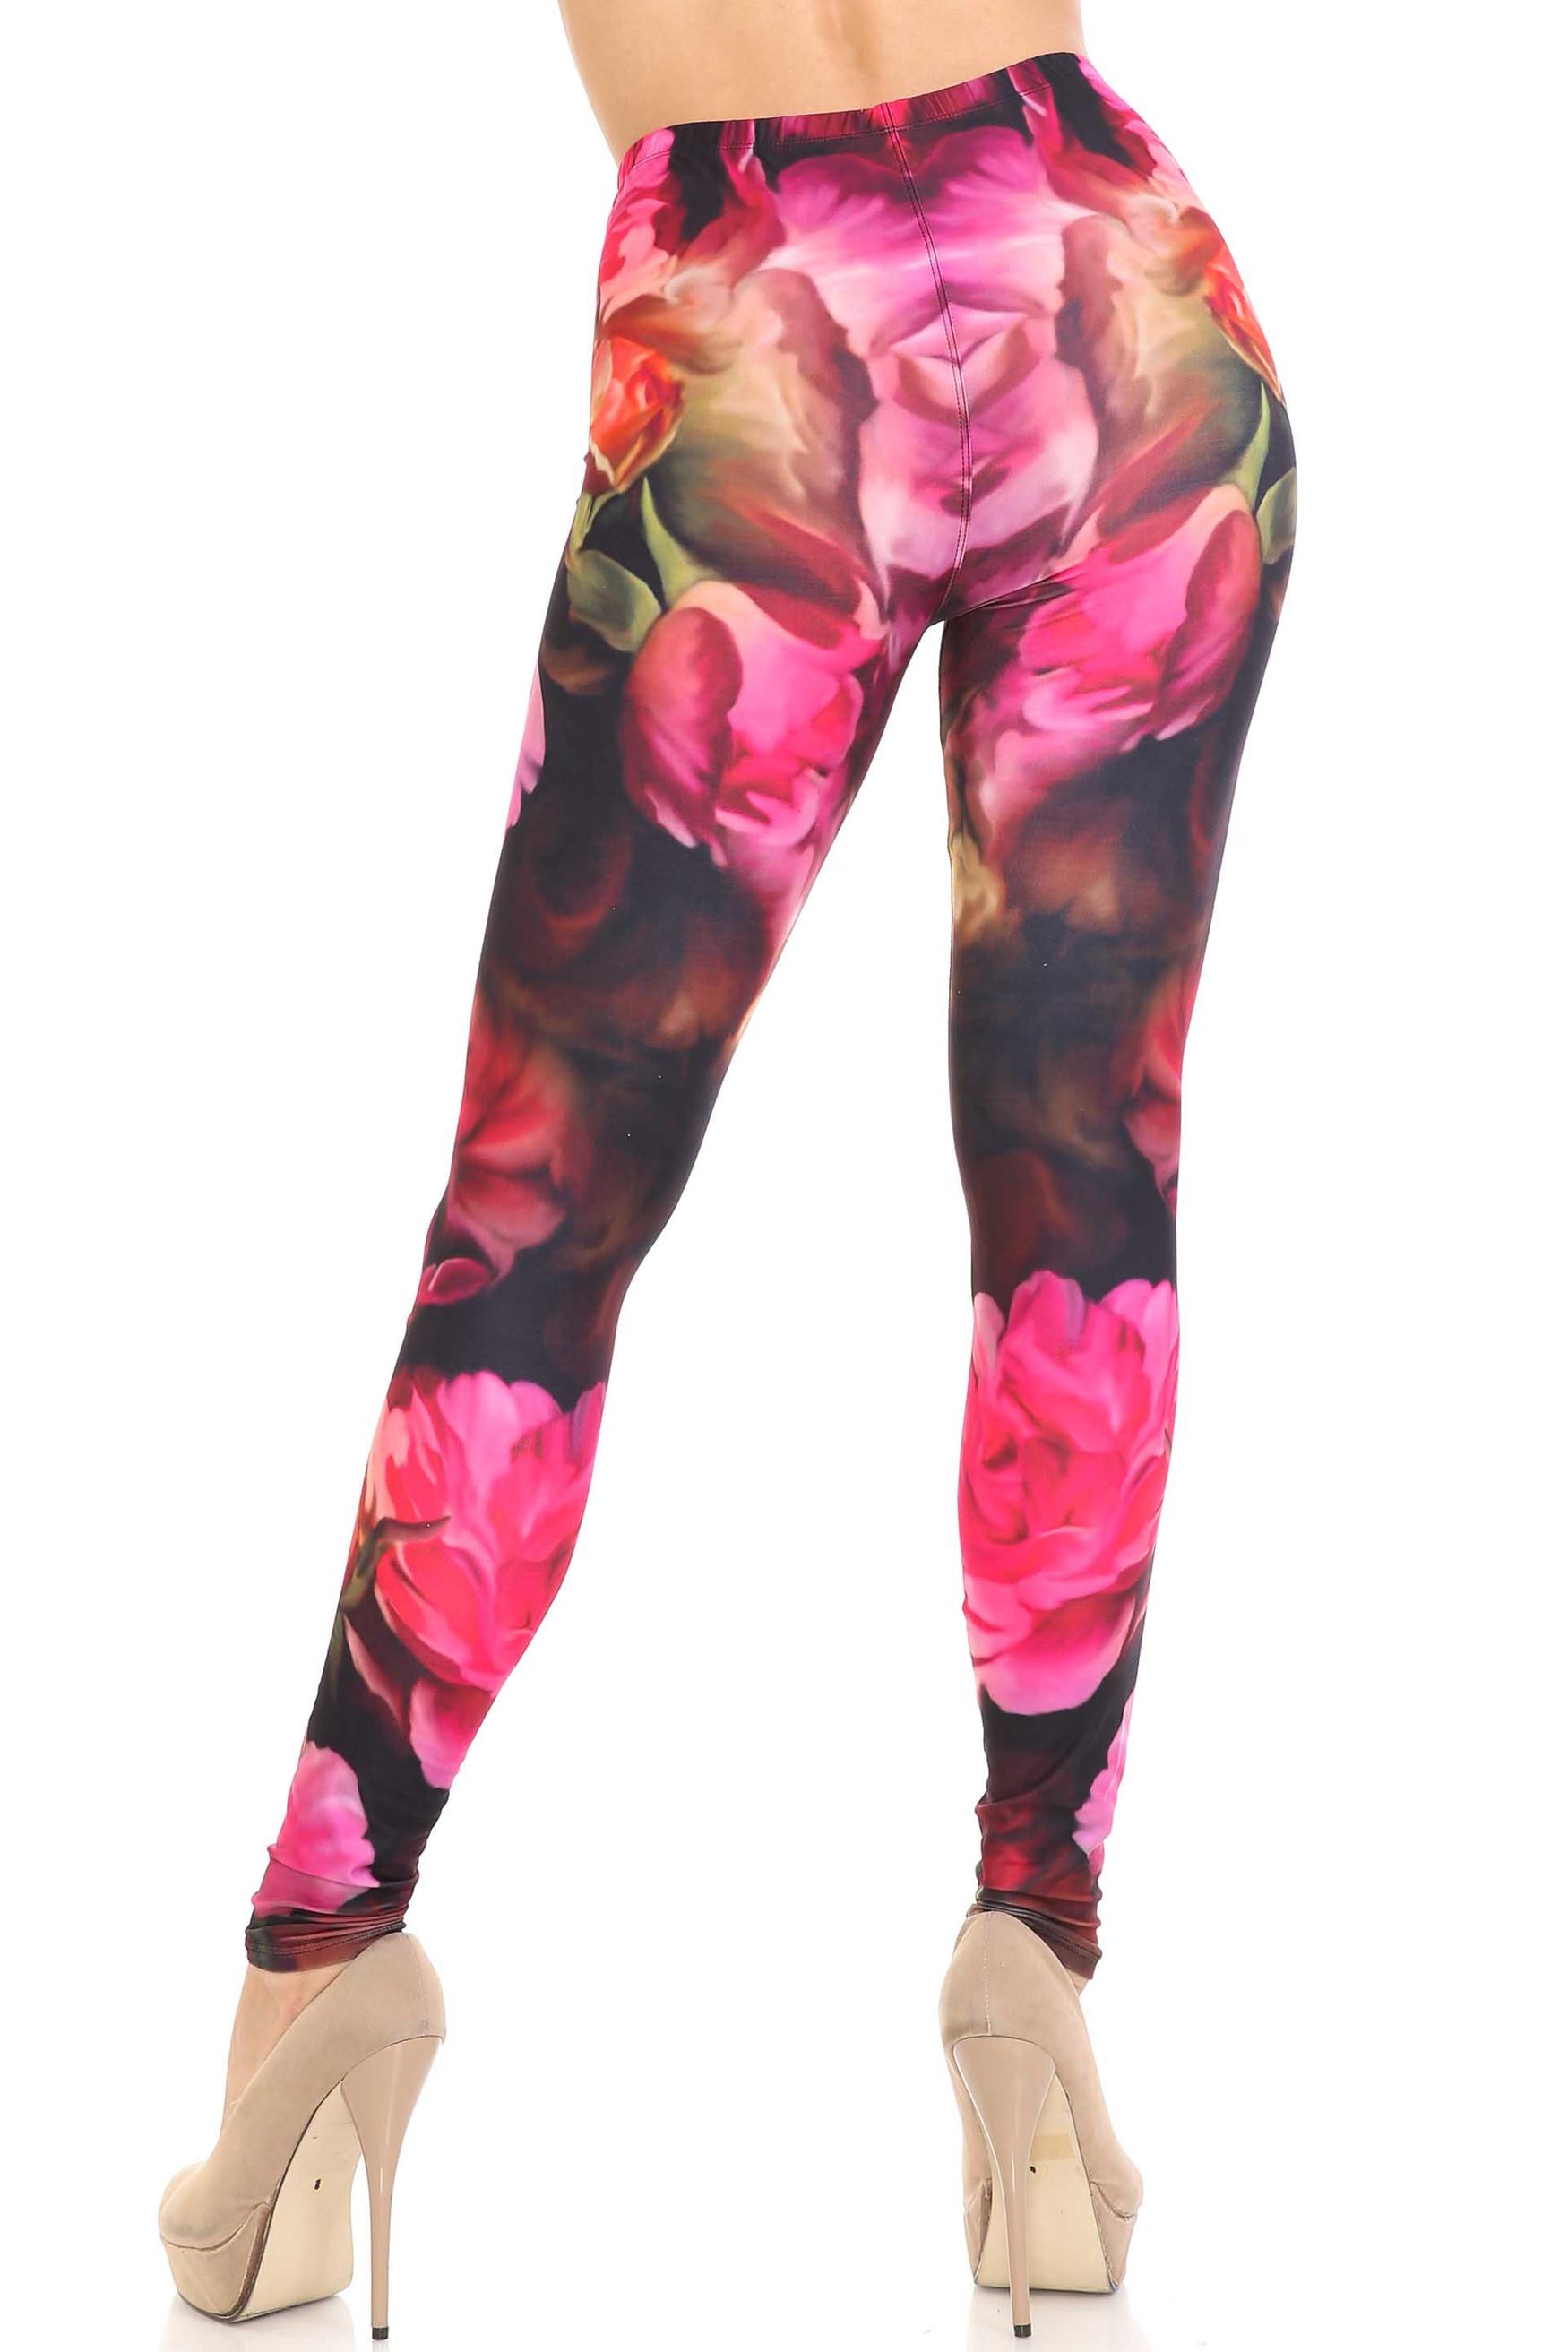 Creamy Soft Vintage Rose Leggings - USA Fashion™